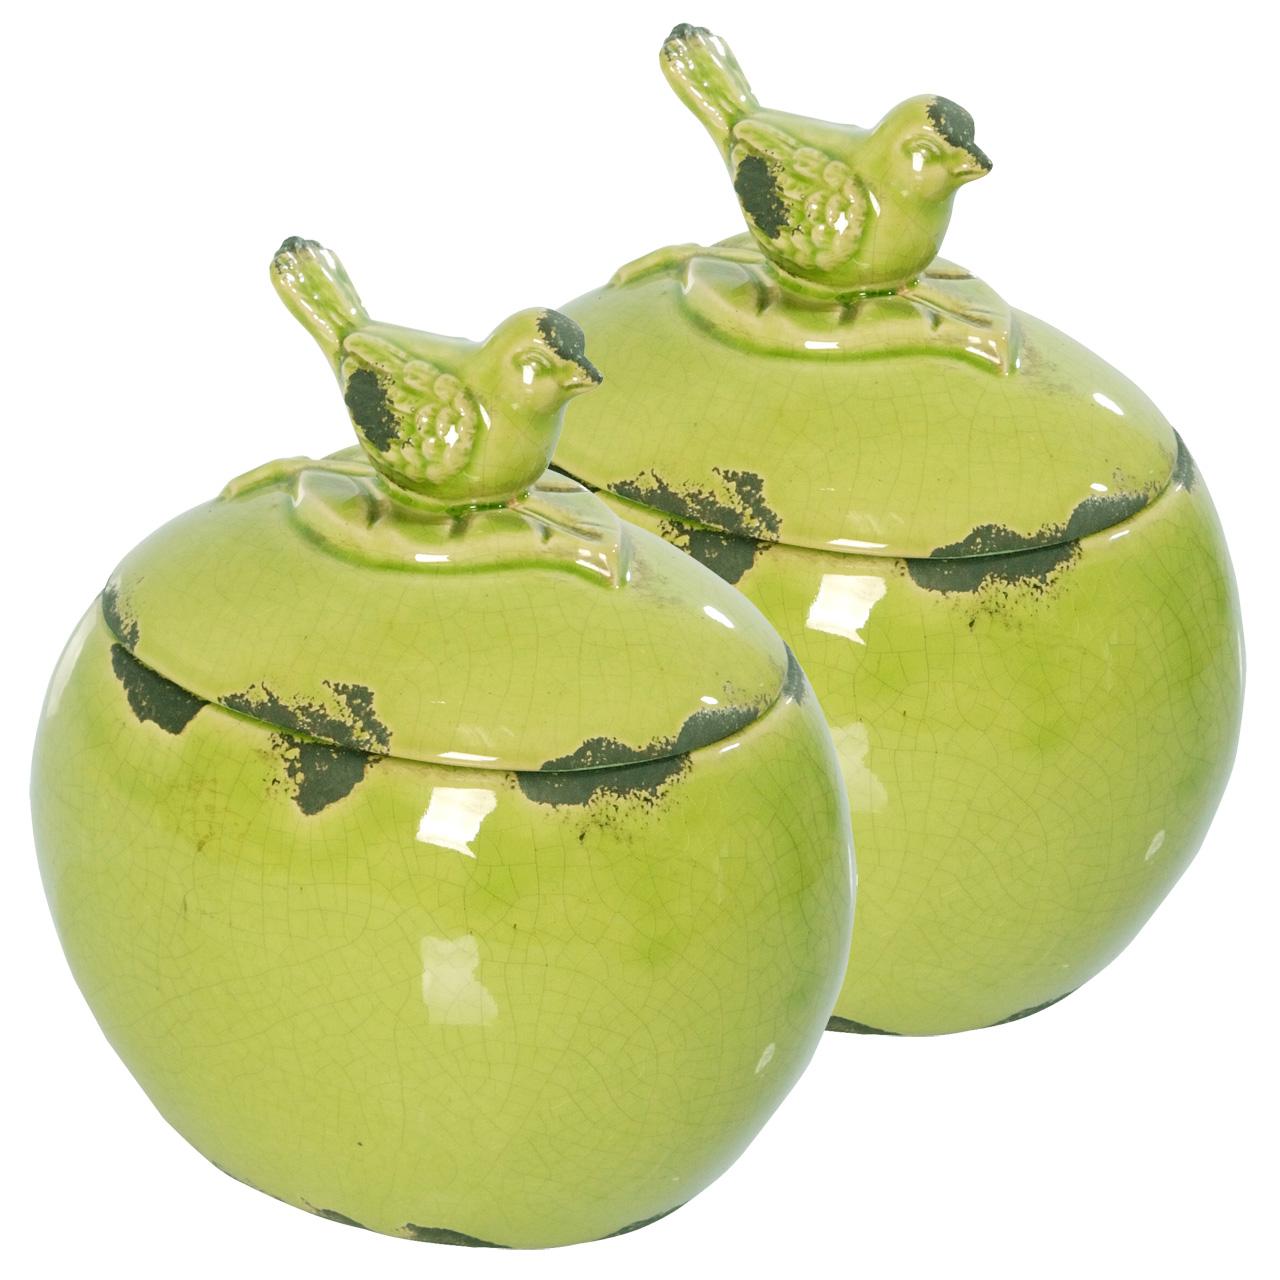 {} ARTEVALUCE Ваза с крышкой Птички Цвет: Зеленый (13х17х18 см - 2 шт) artevaluce ваза с крышкой orlenda цвет зеленый 11х17х51 см